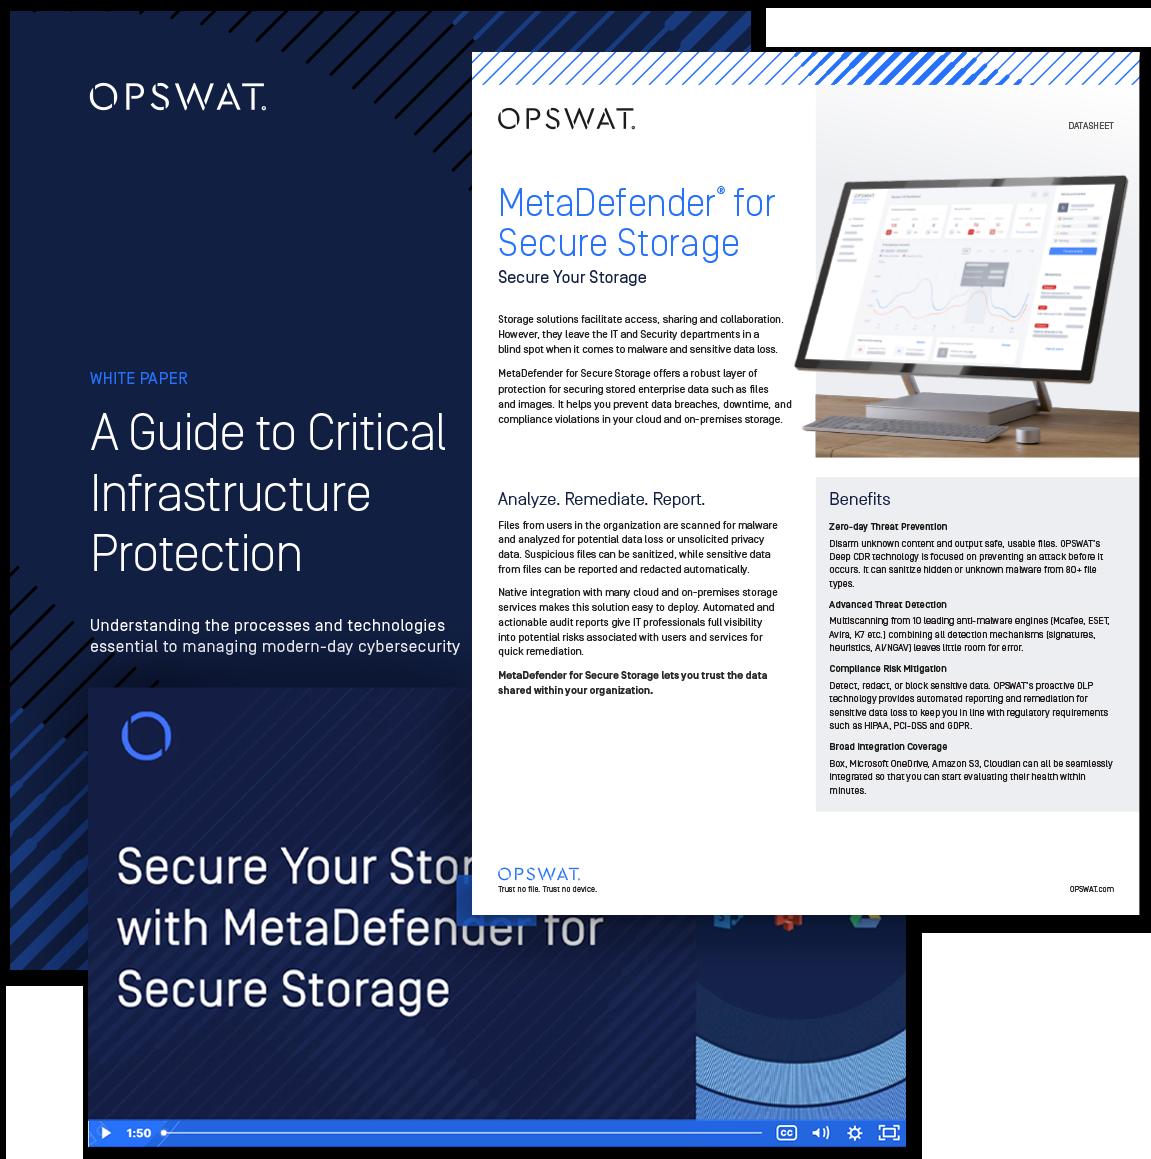 Thumbnail-Data Storate Security